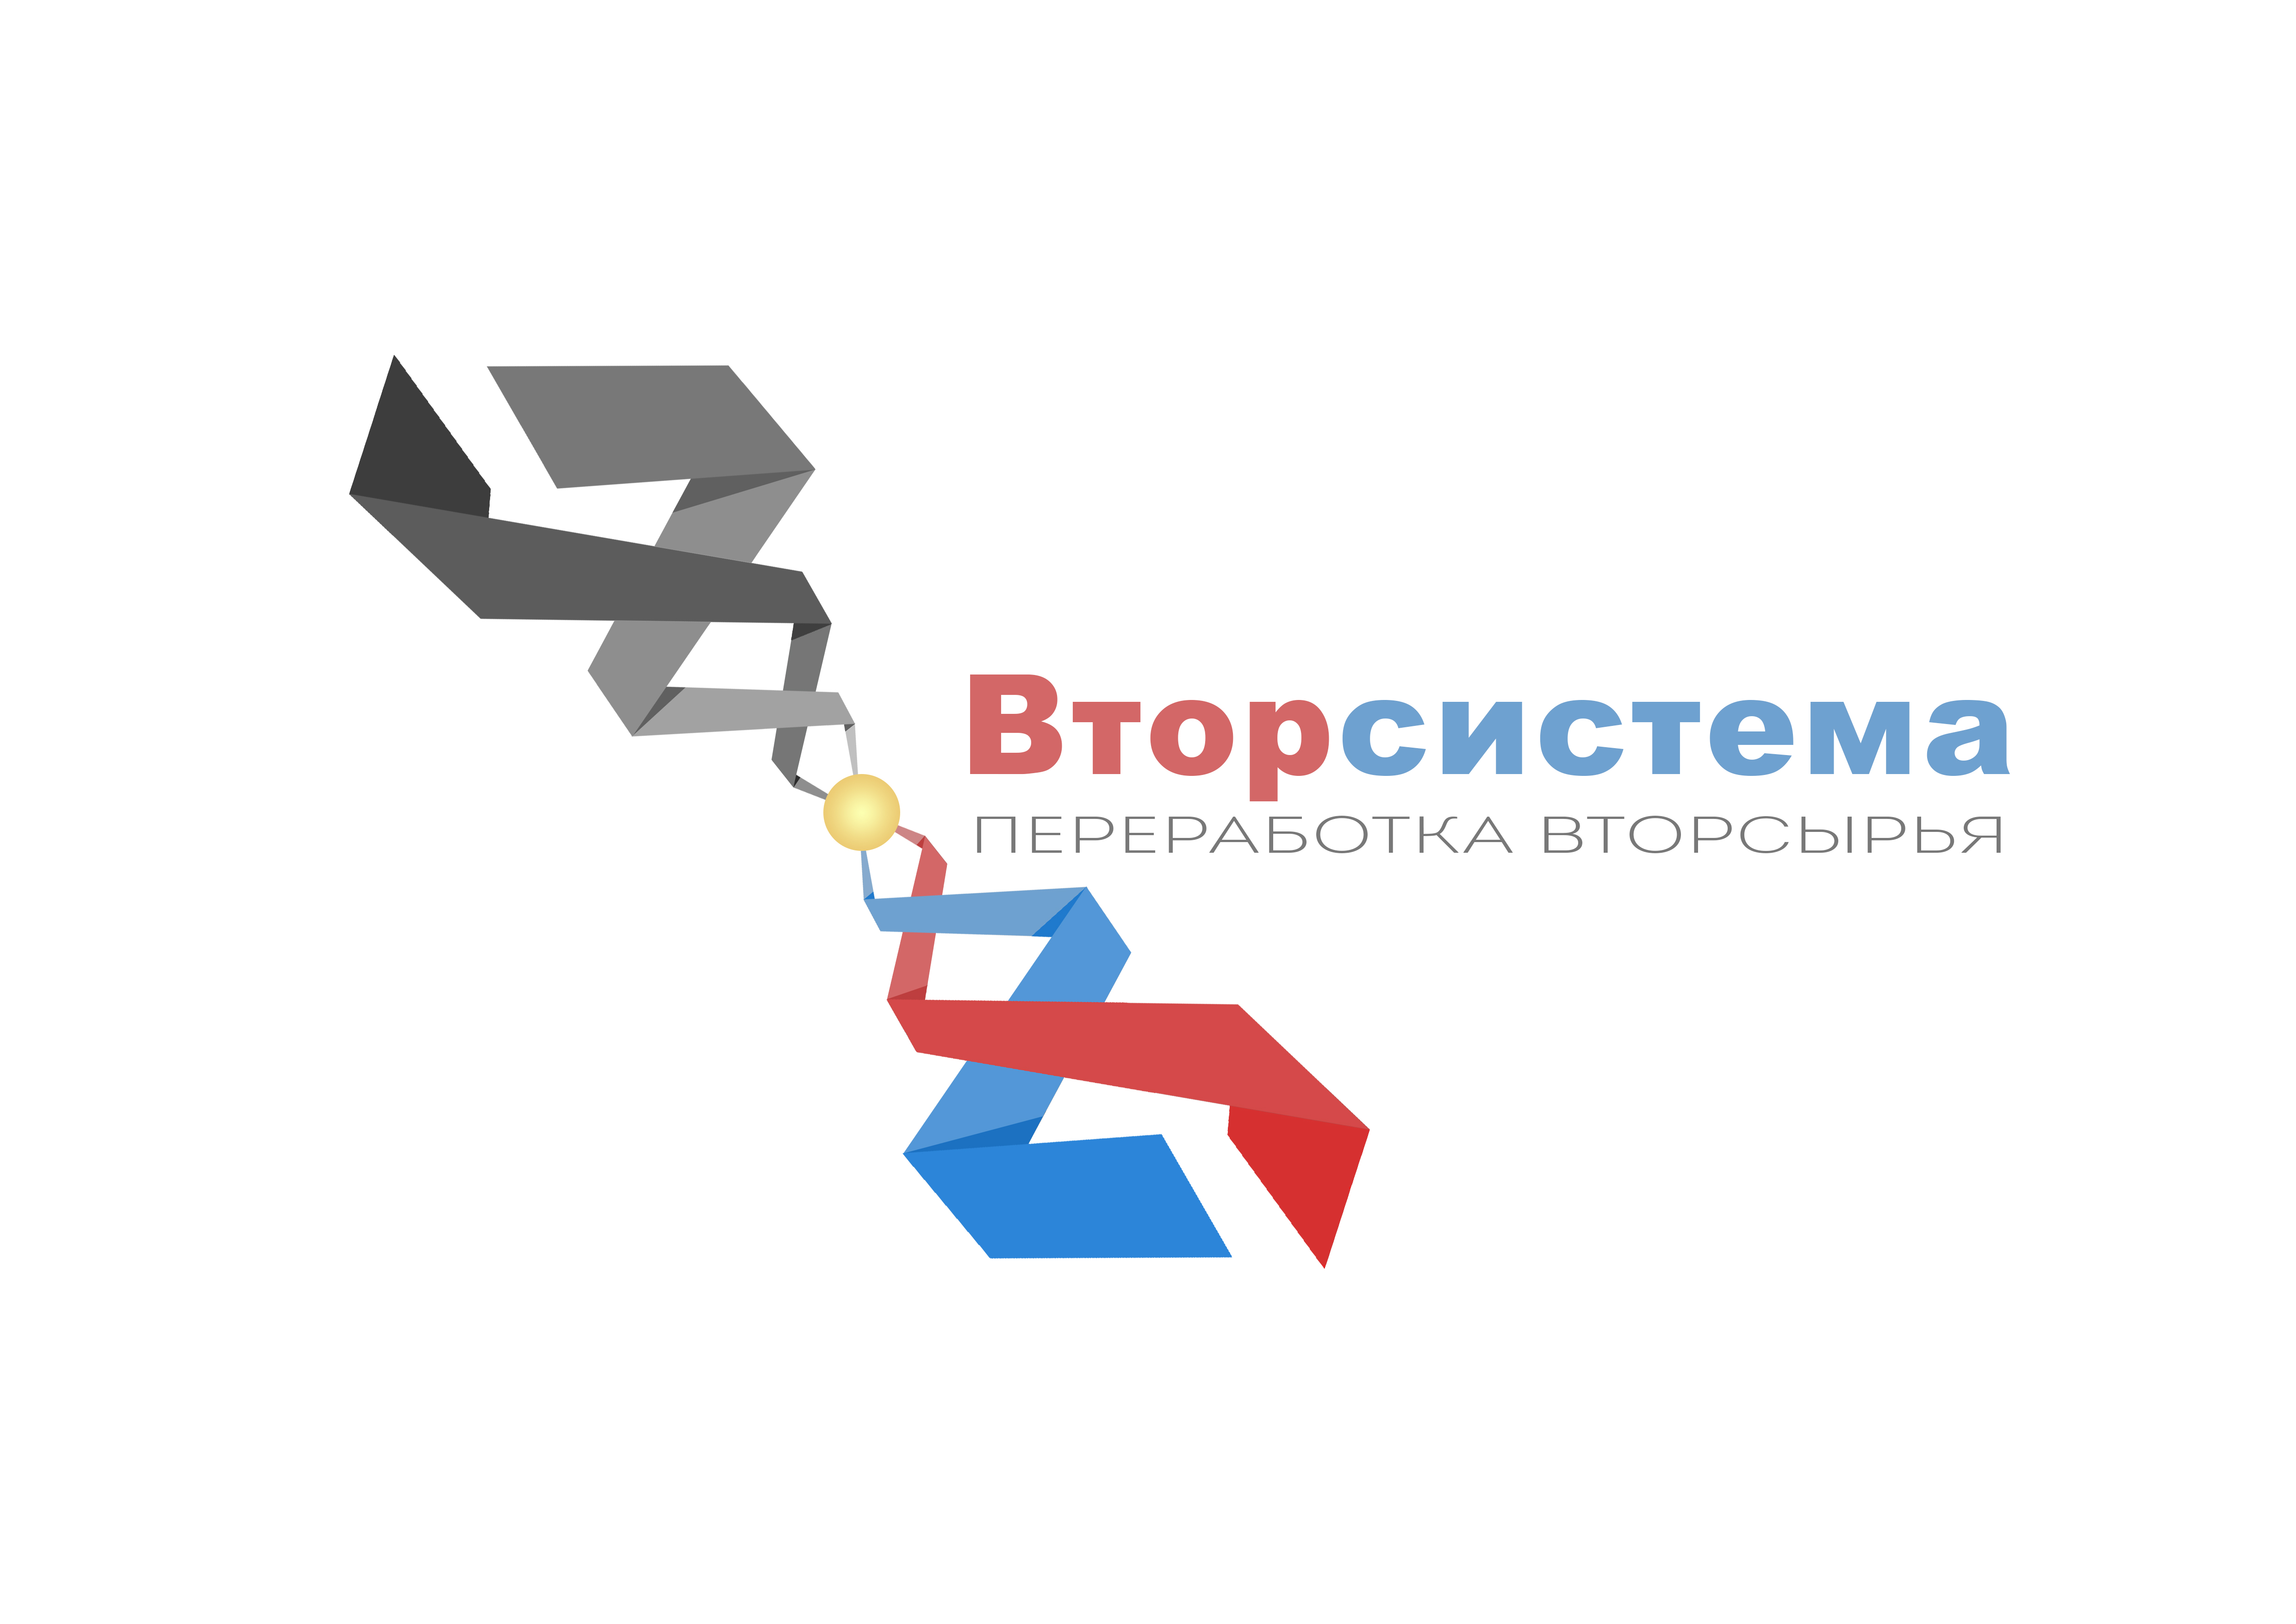 Нужно разработать логотип и дизайн визитки фото f_855554d24cca5f28.jpg